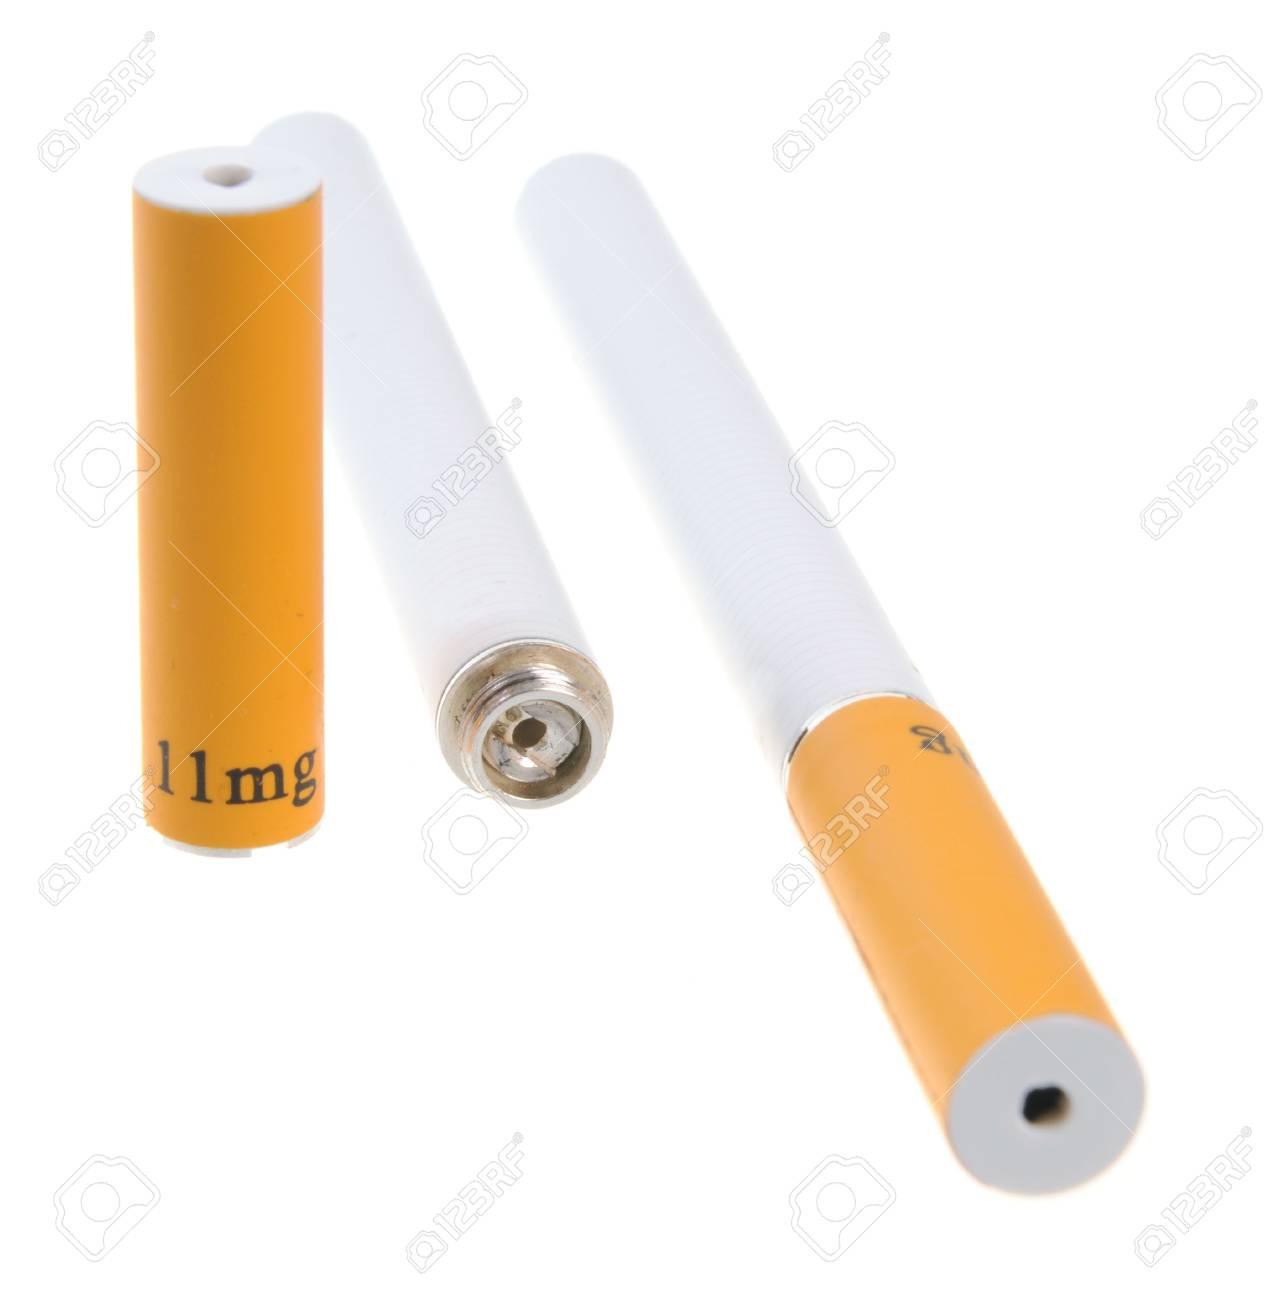 Electronic cigarette isolated on white background Stock Photo - 6384918